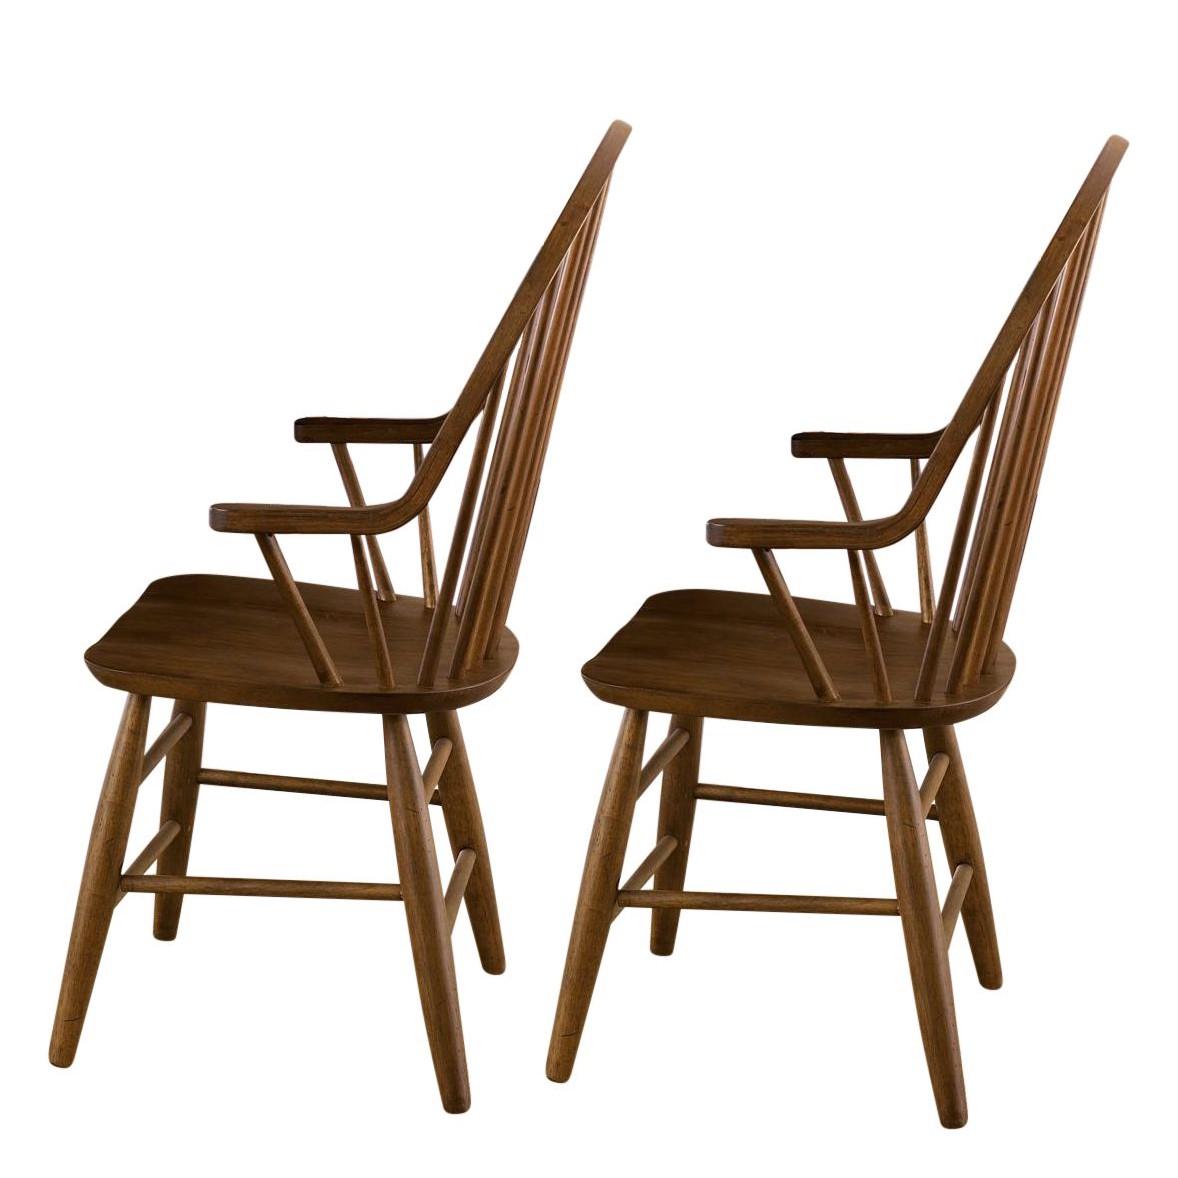 Armleunstoelen Marty (2-delige set) - bruin massief rubberboomhout, Maison Belfort